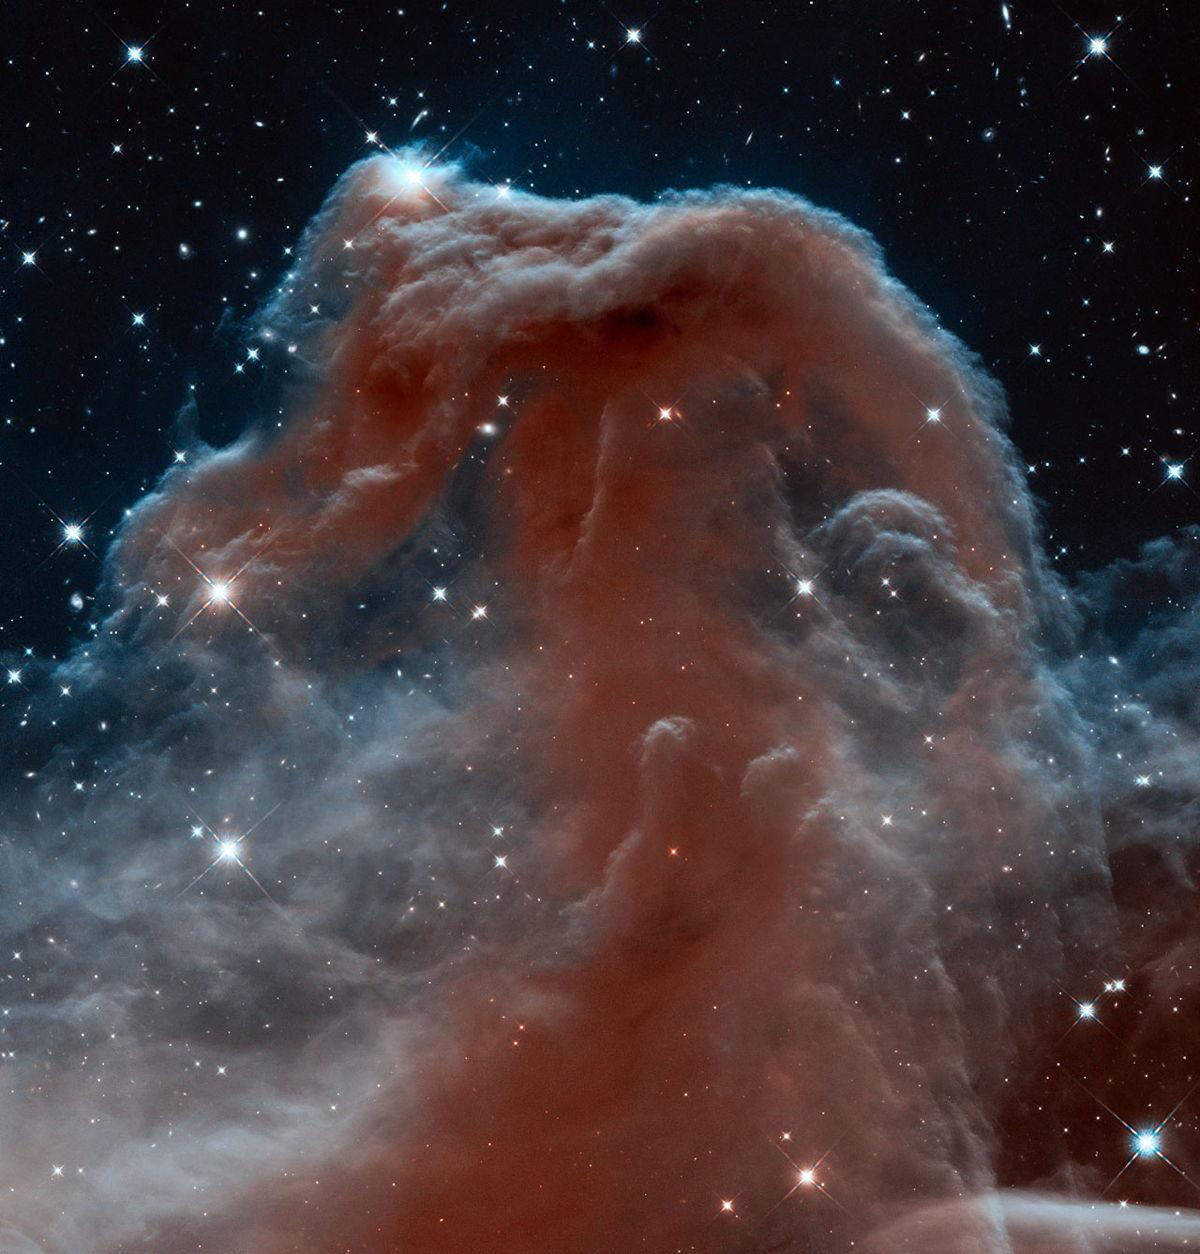 Hubble Space Telescope Snaps Stunning Nebula Photo on 23rd ...